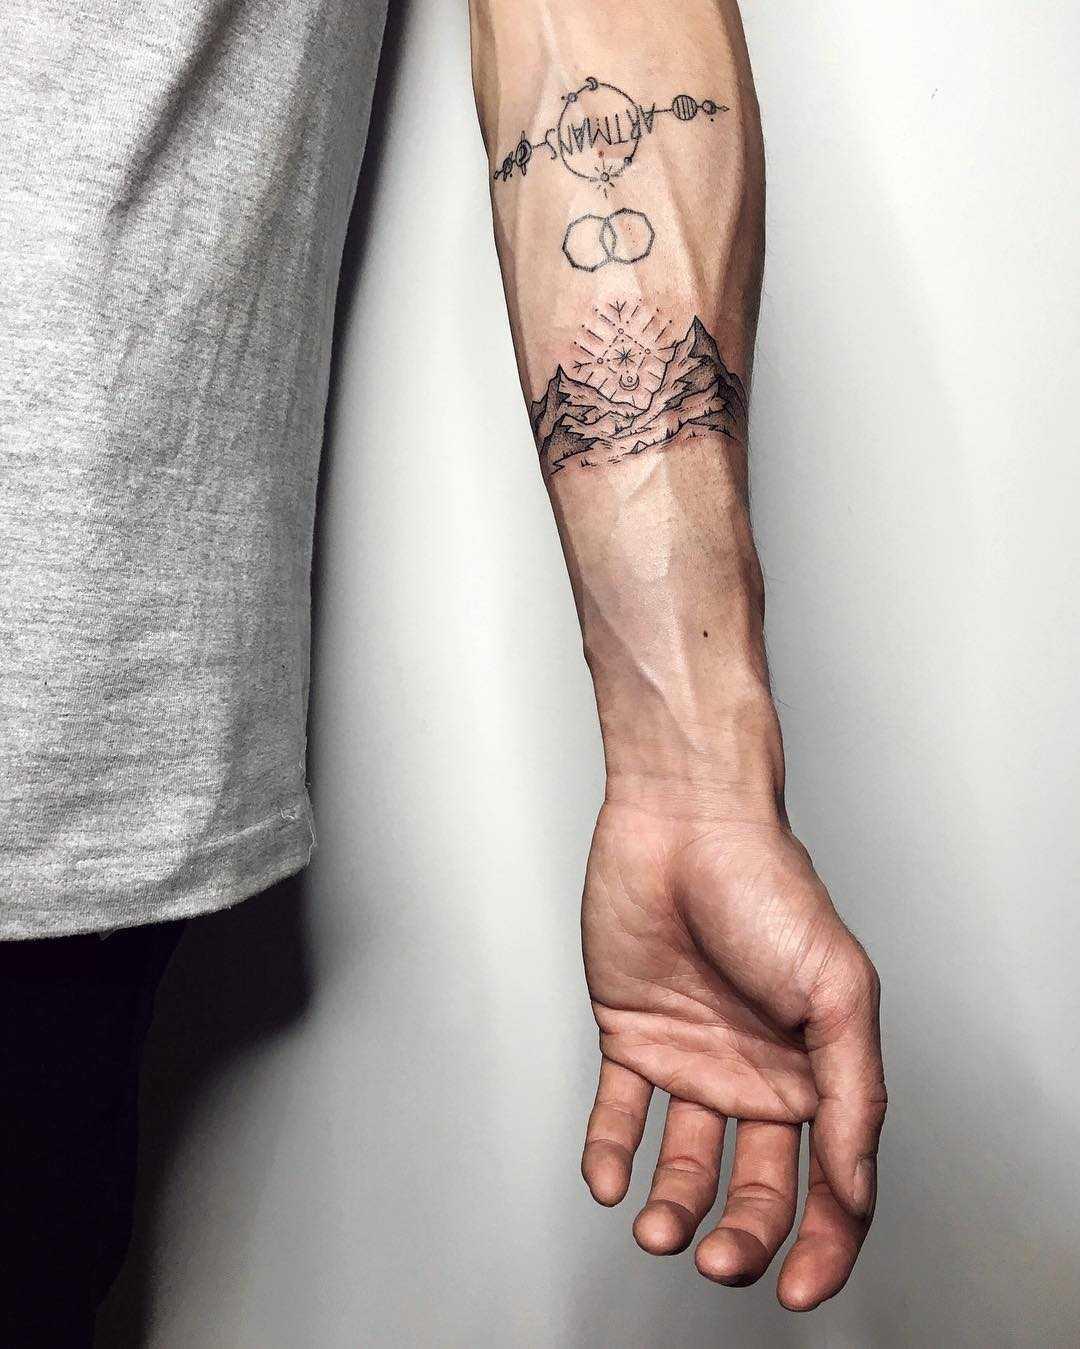 Minimalist mountains tattoo by Sasha Tattooing